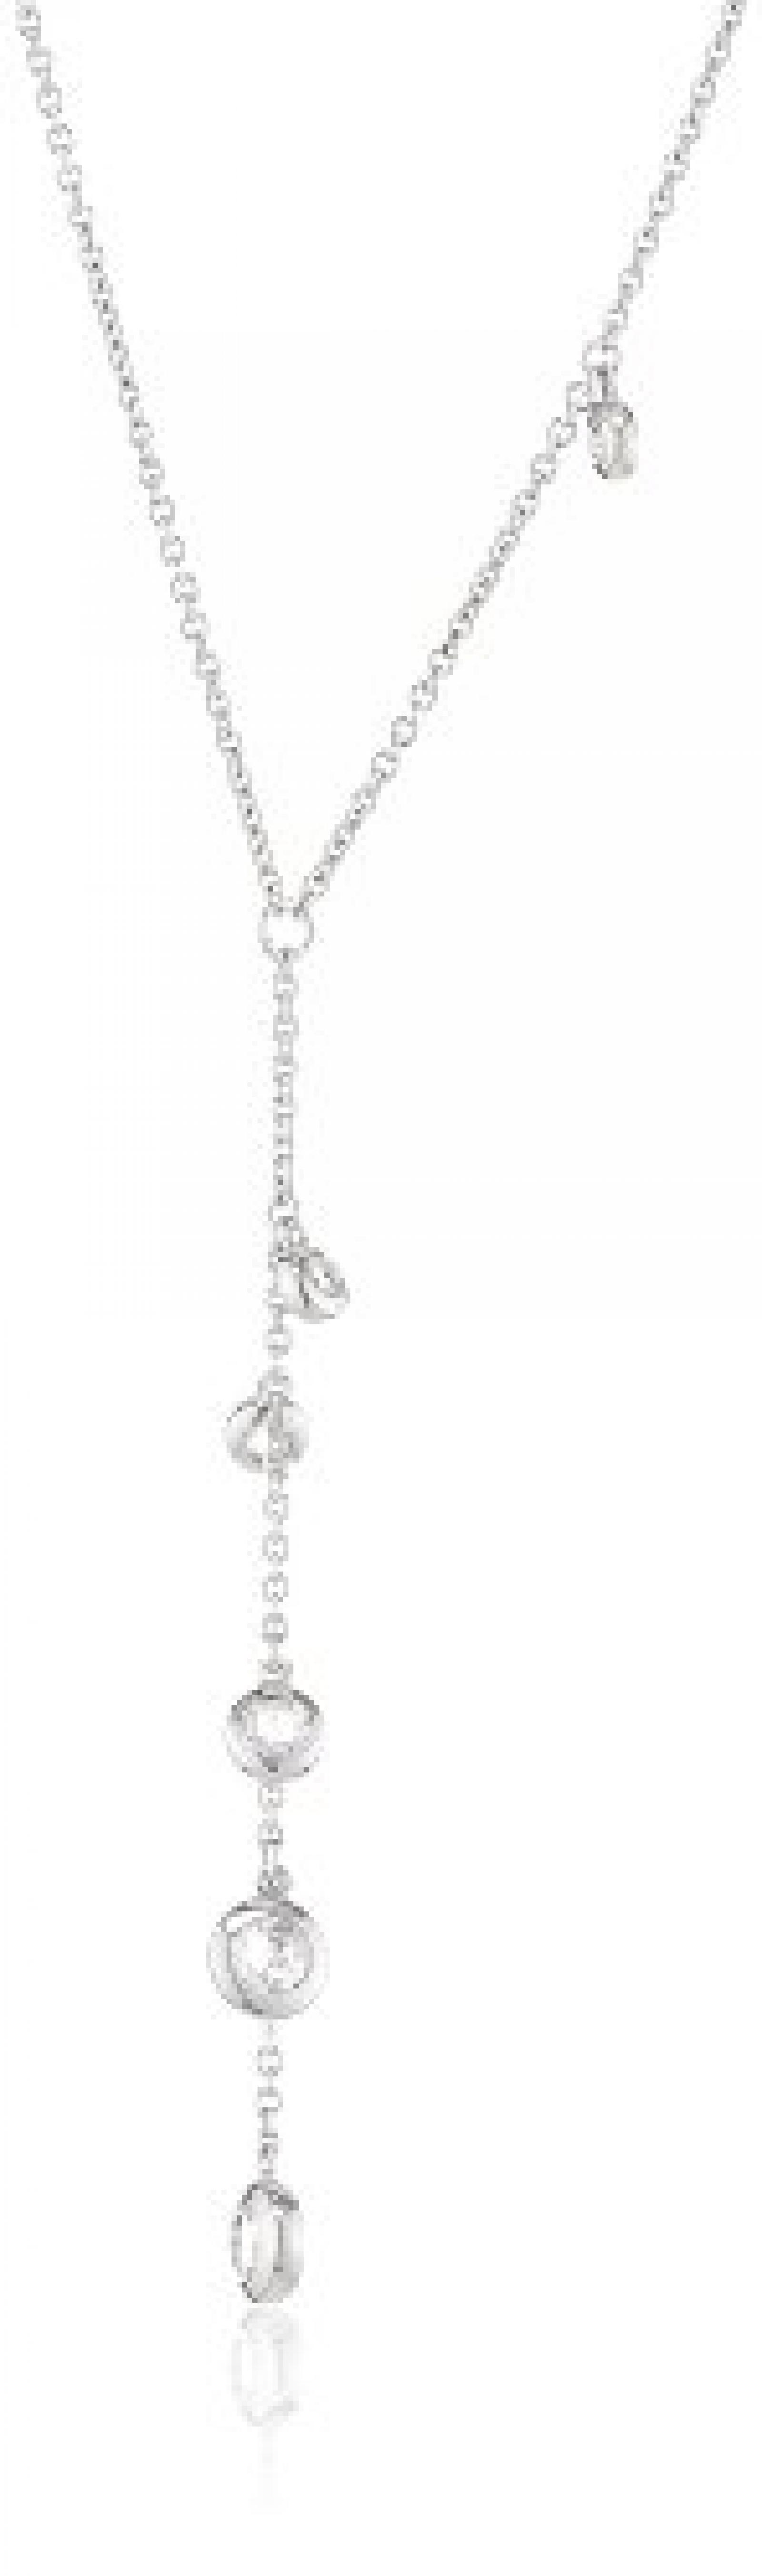 Pierre Cardin Damen Halskette 925 Sterling Silber rhodiniert Kristall Zirkonia Poussières détoiles 42 cm weiß PCNL90409A420